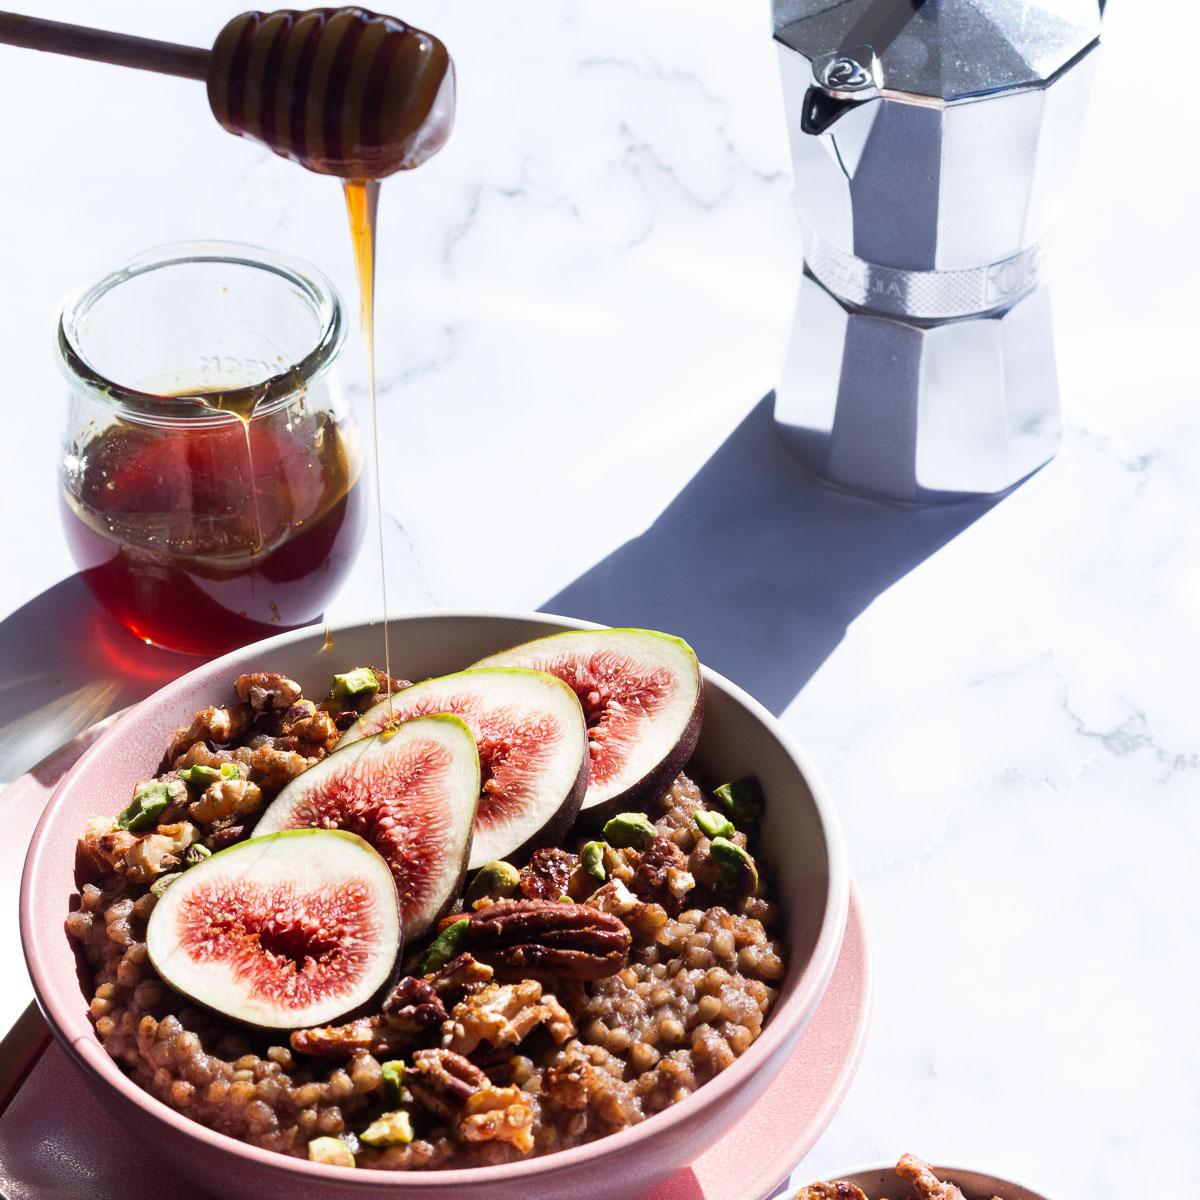 Honey drizzled over Buckwheat Baklava Porridge